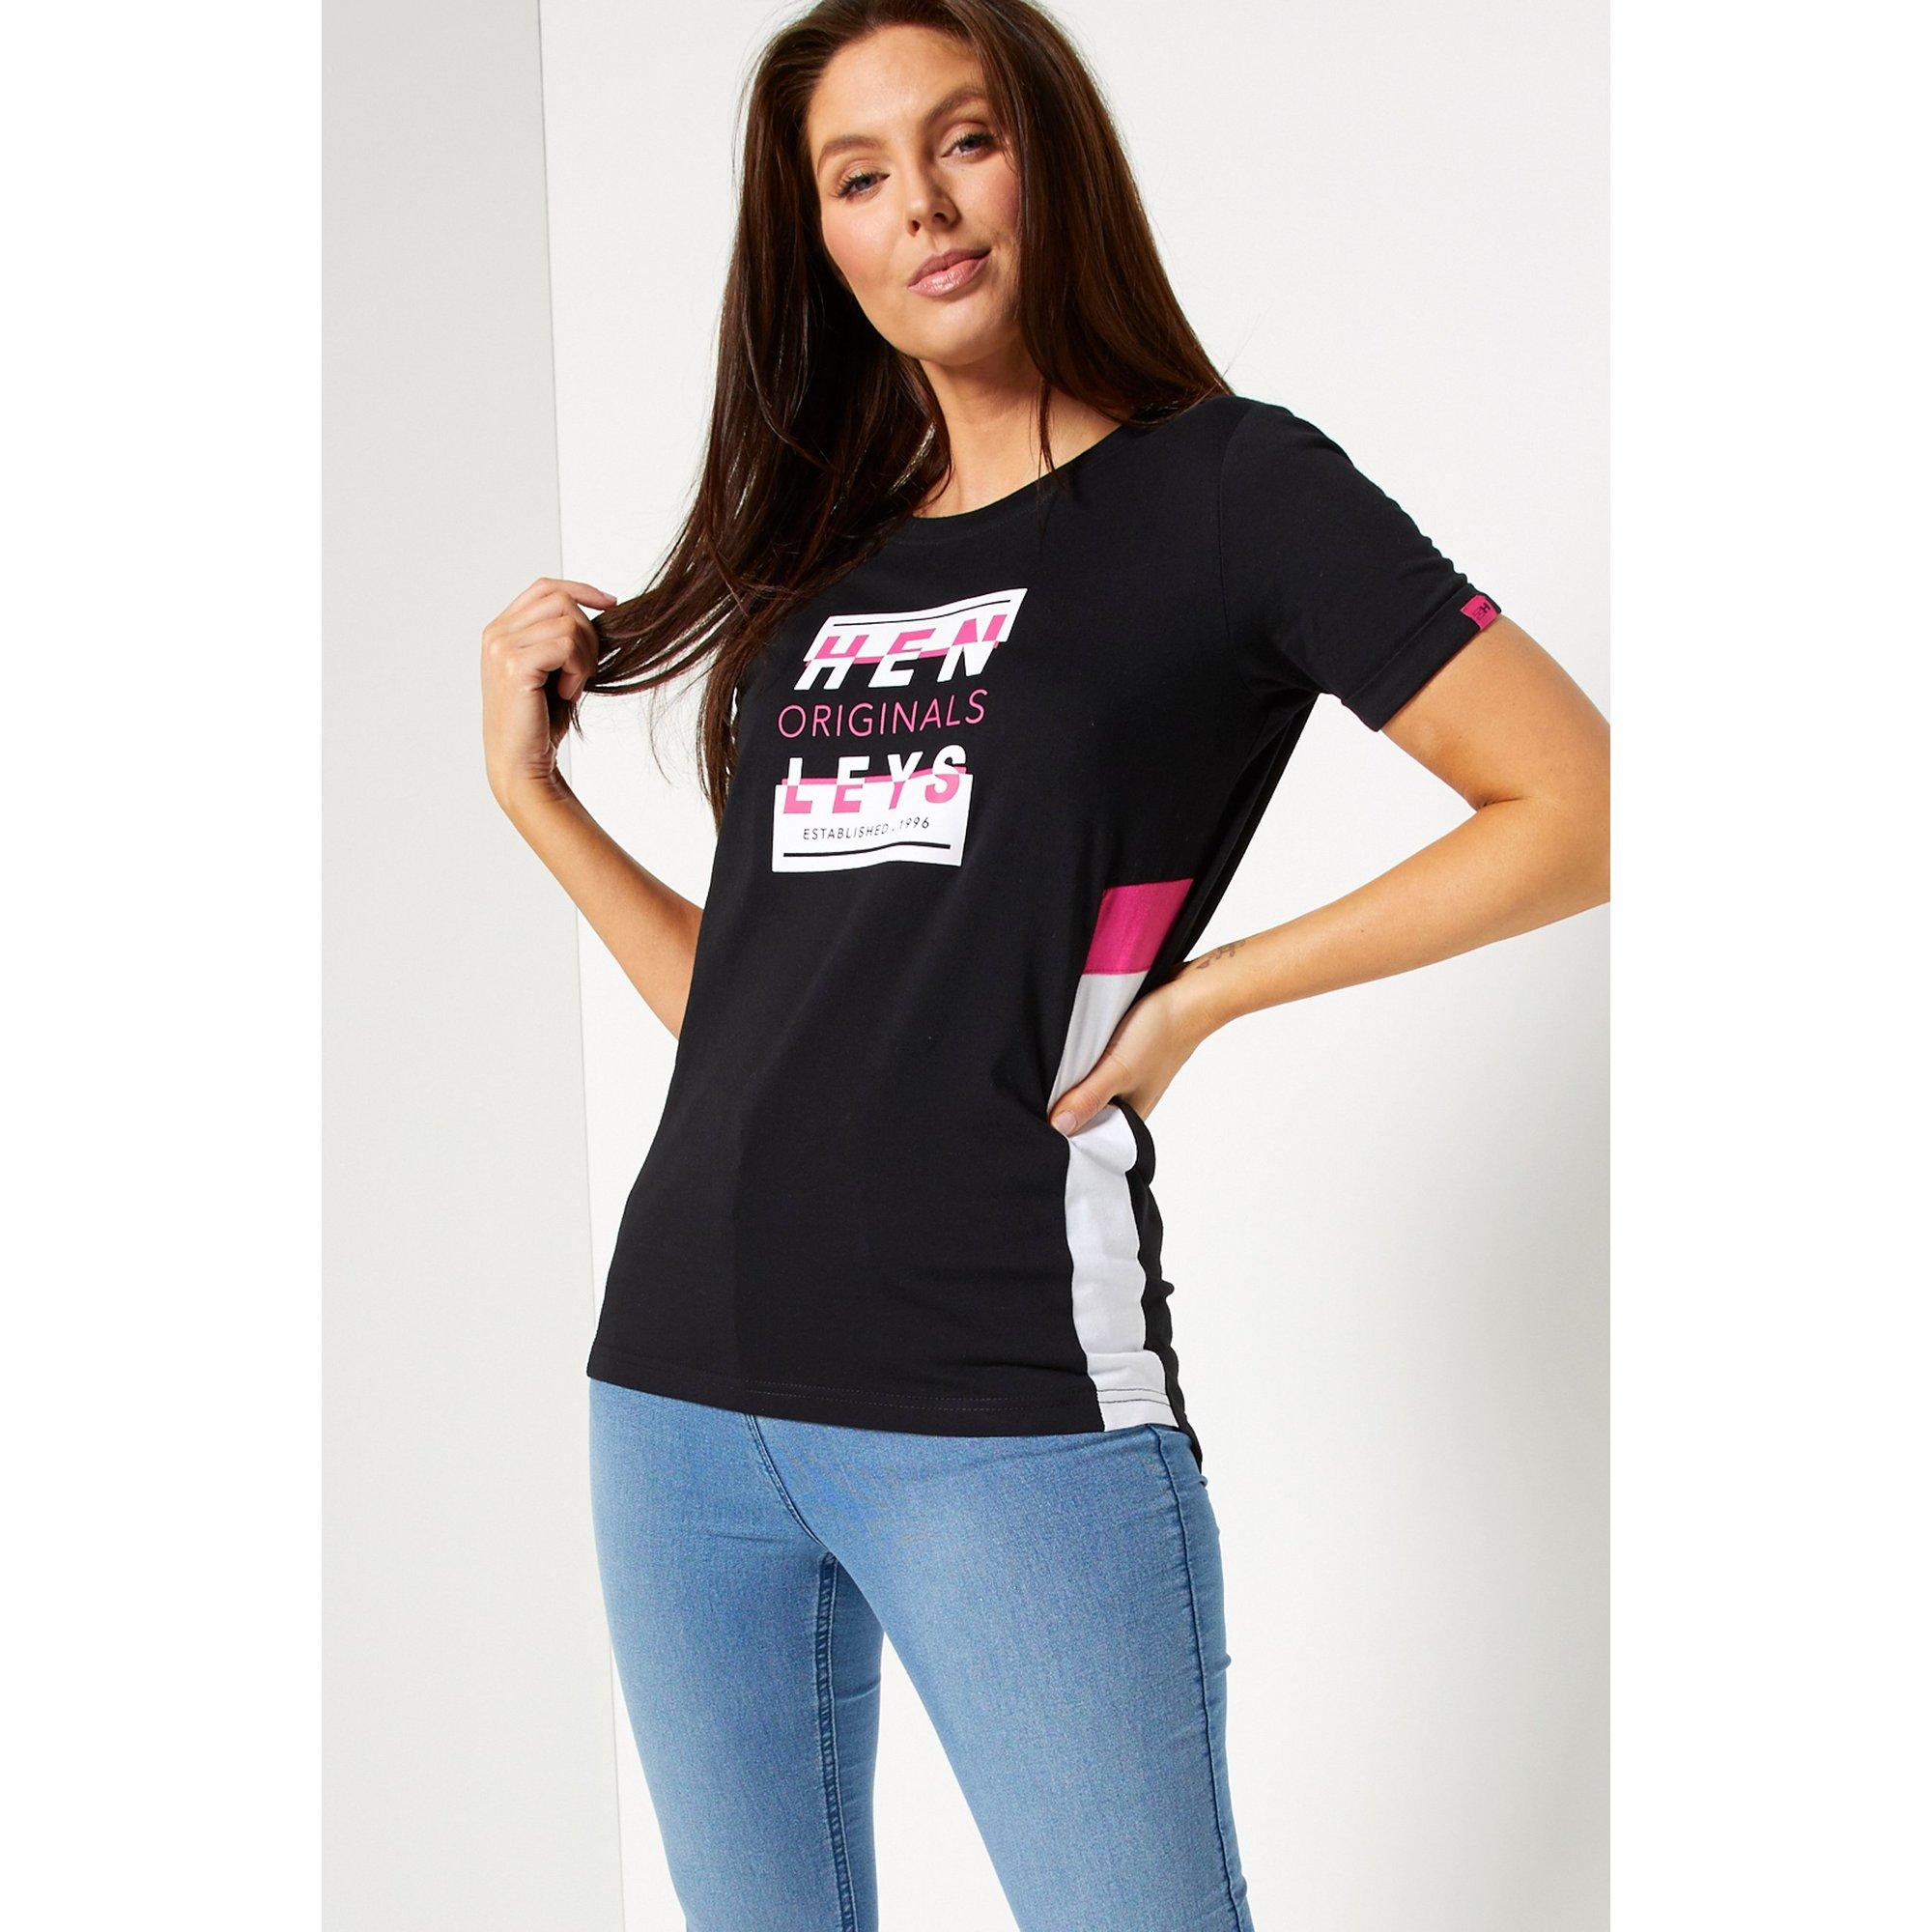 Image of Henleys Black/Pink Logo T-Shirt